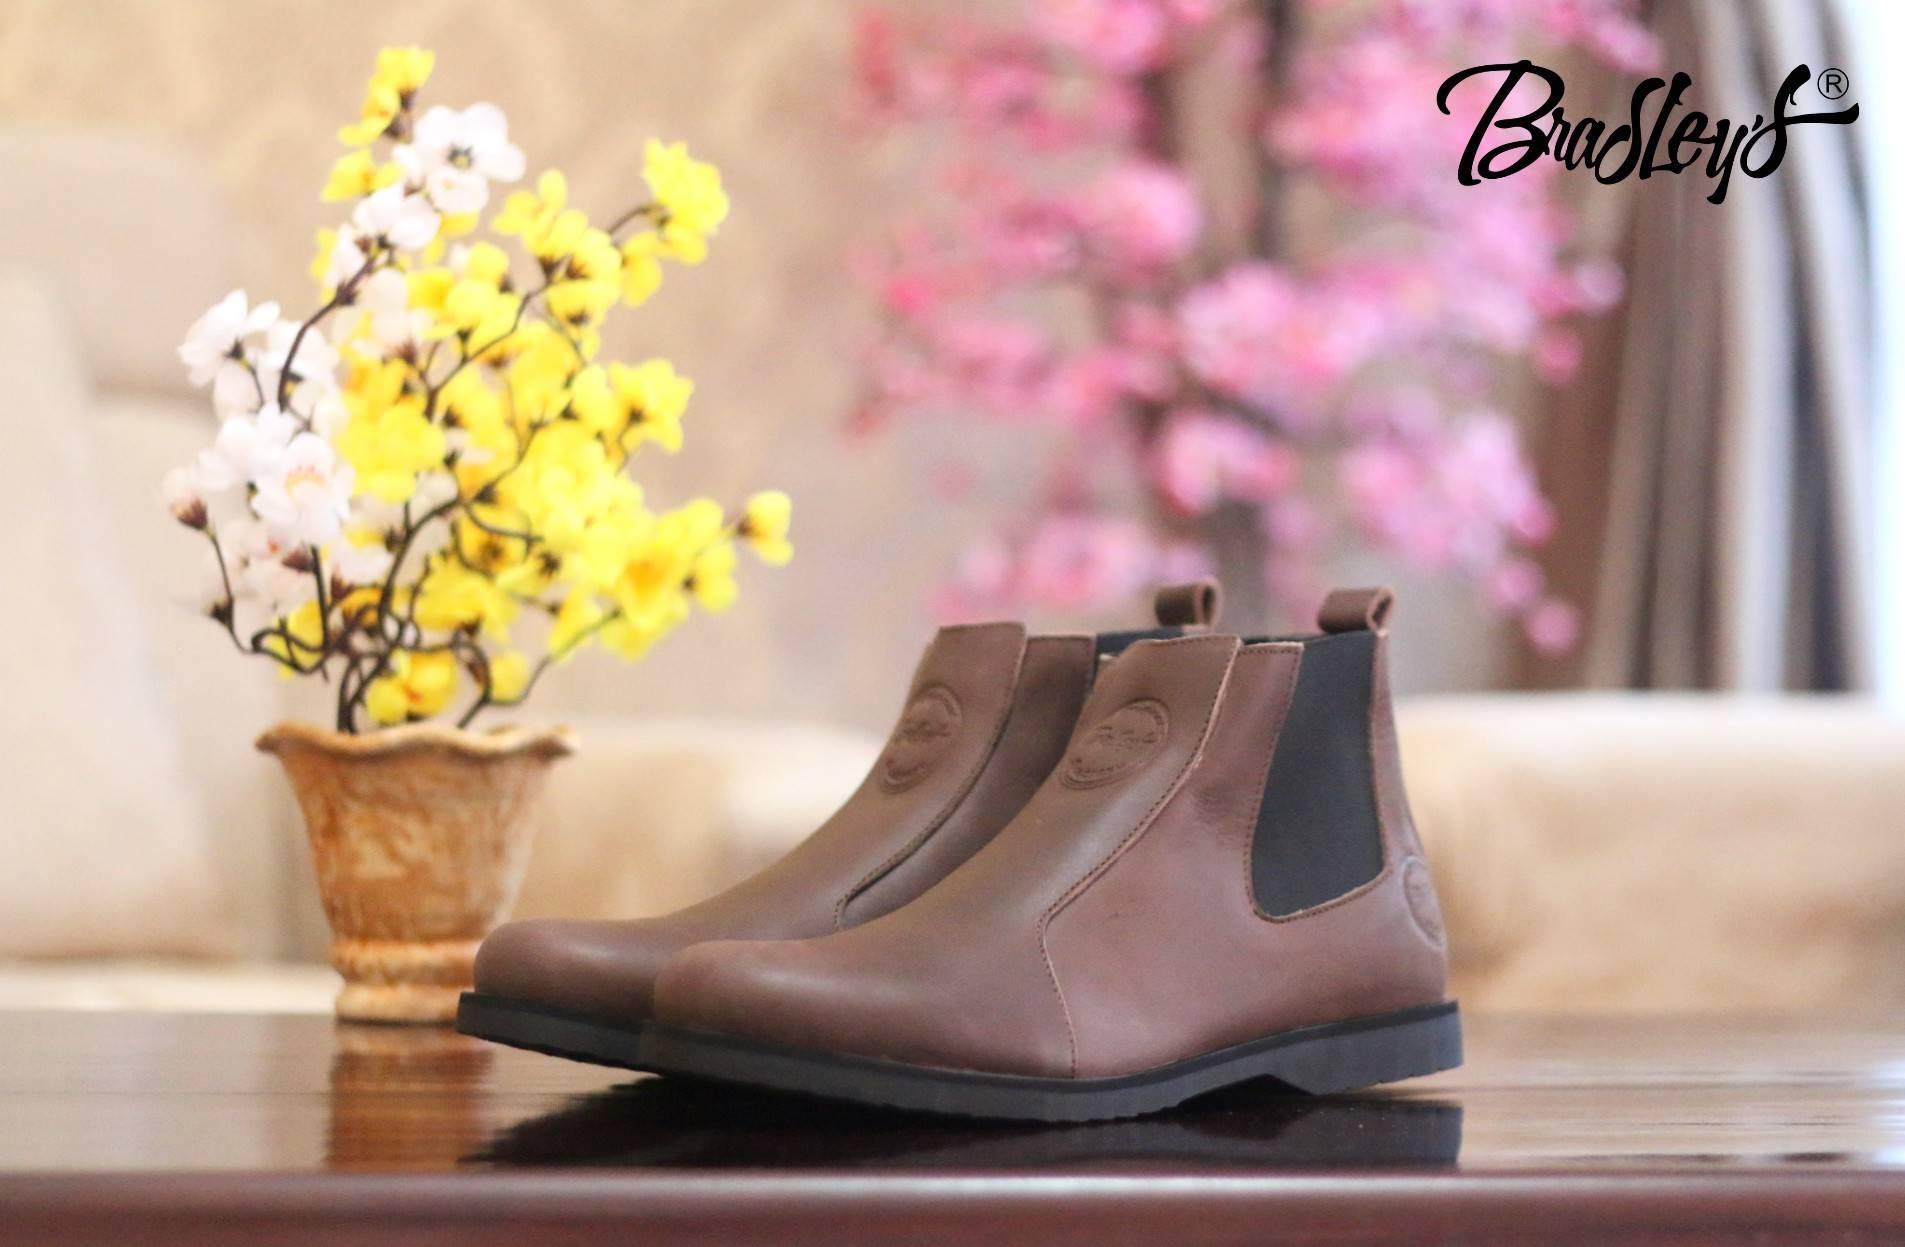 Sepatu Boots Kulit Asli - NEW Sepatu Boots Karet - Brodo Bradleys Brodo  Sepatu Boots Pria be05fab5dd